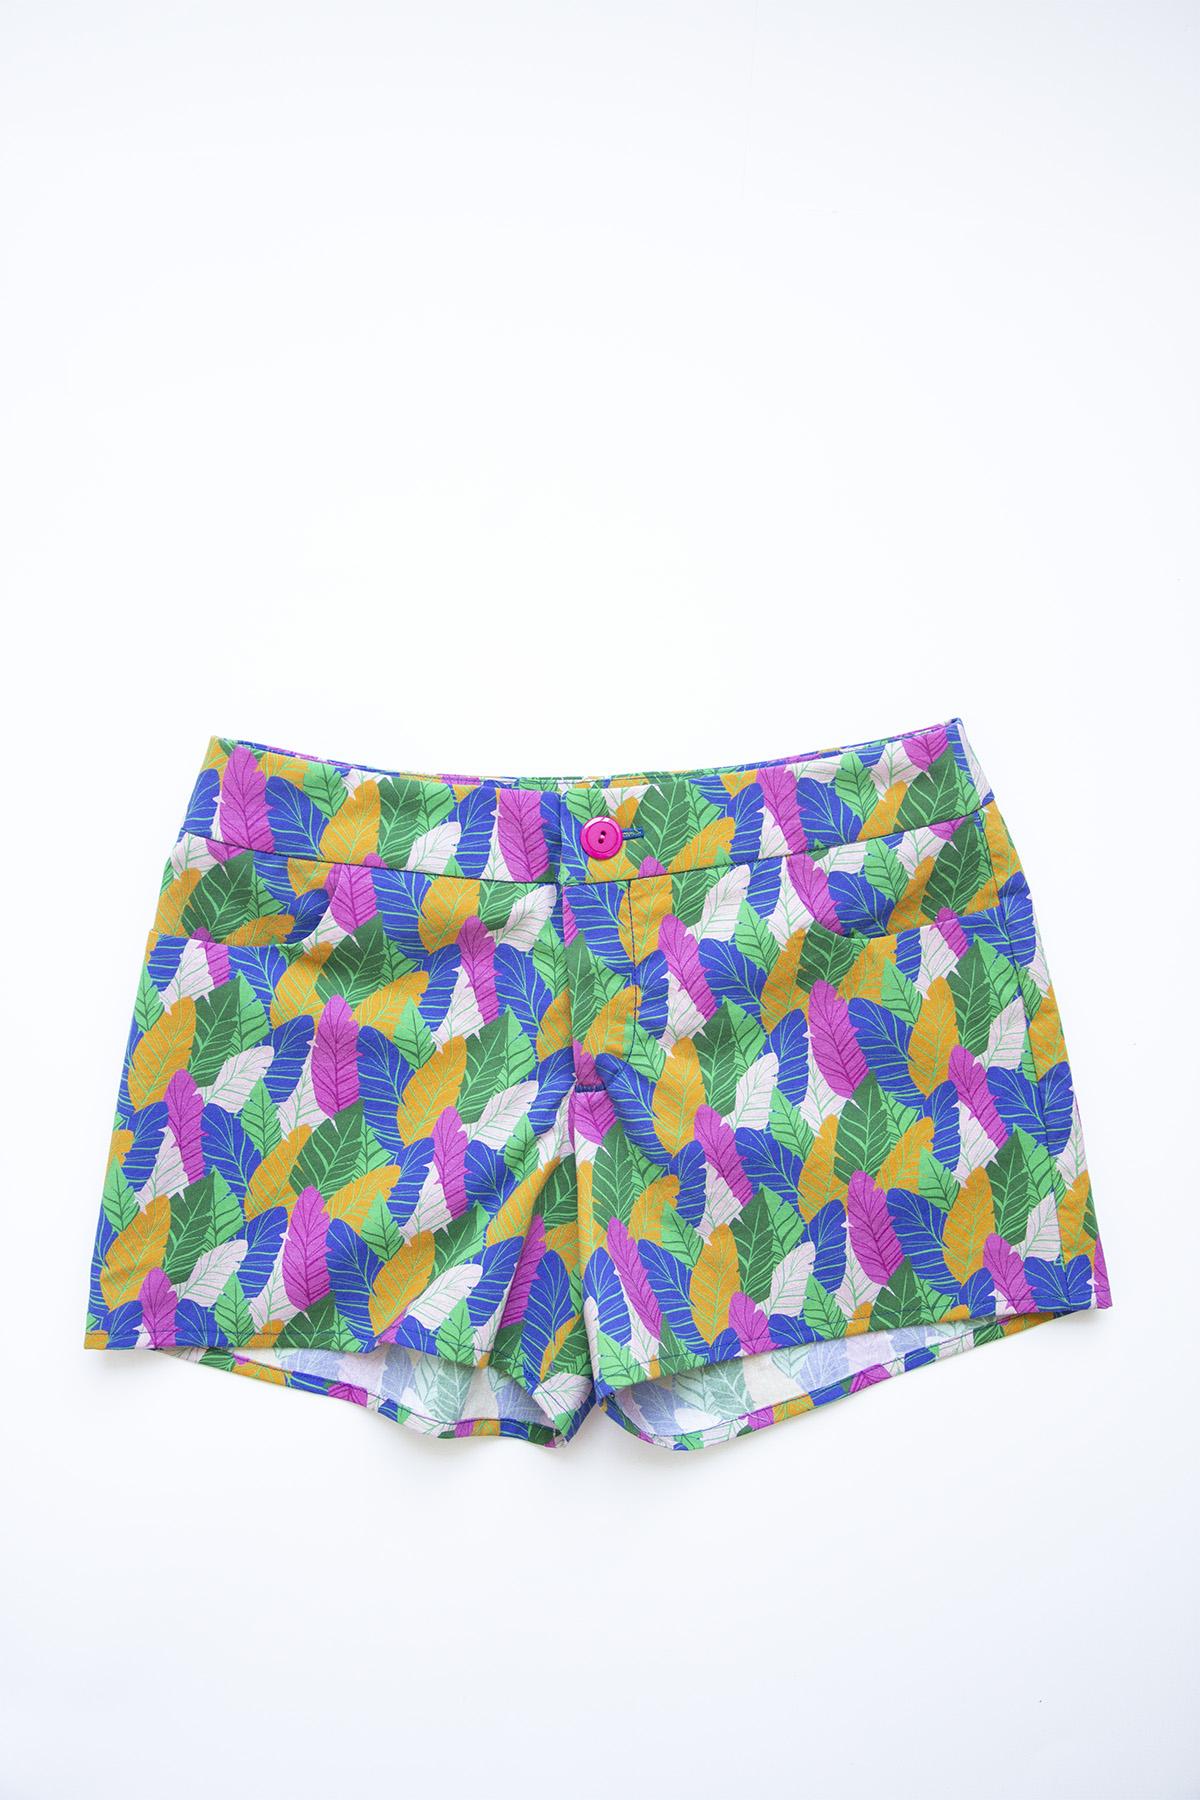 TropicalJammin_Shorts_FLAT.jpg